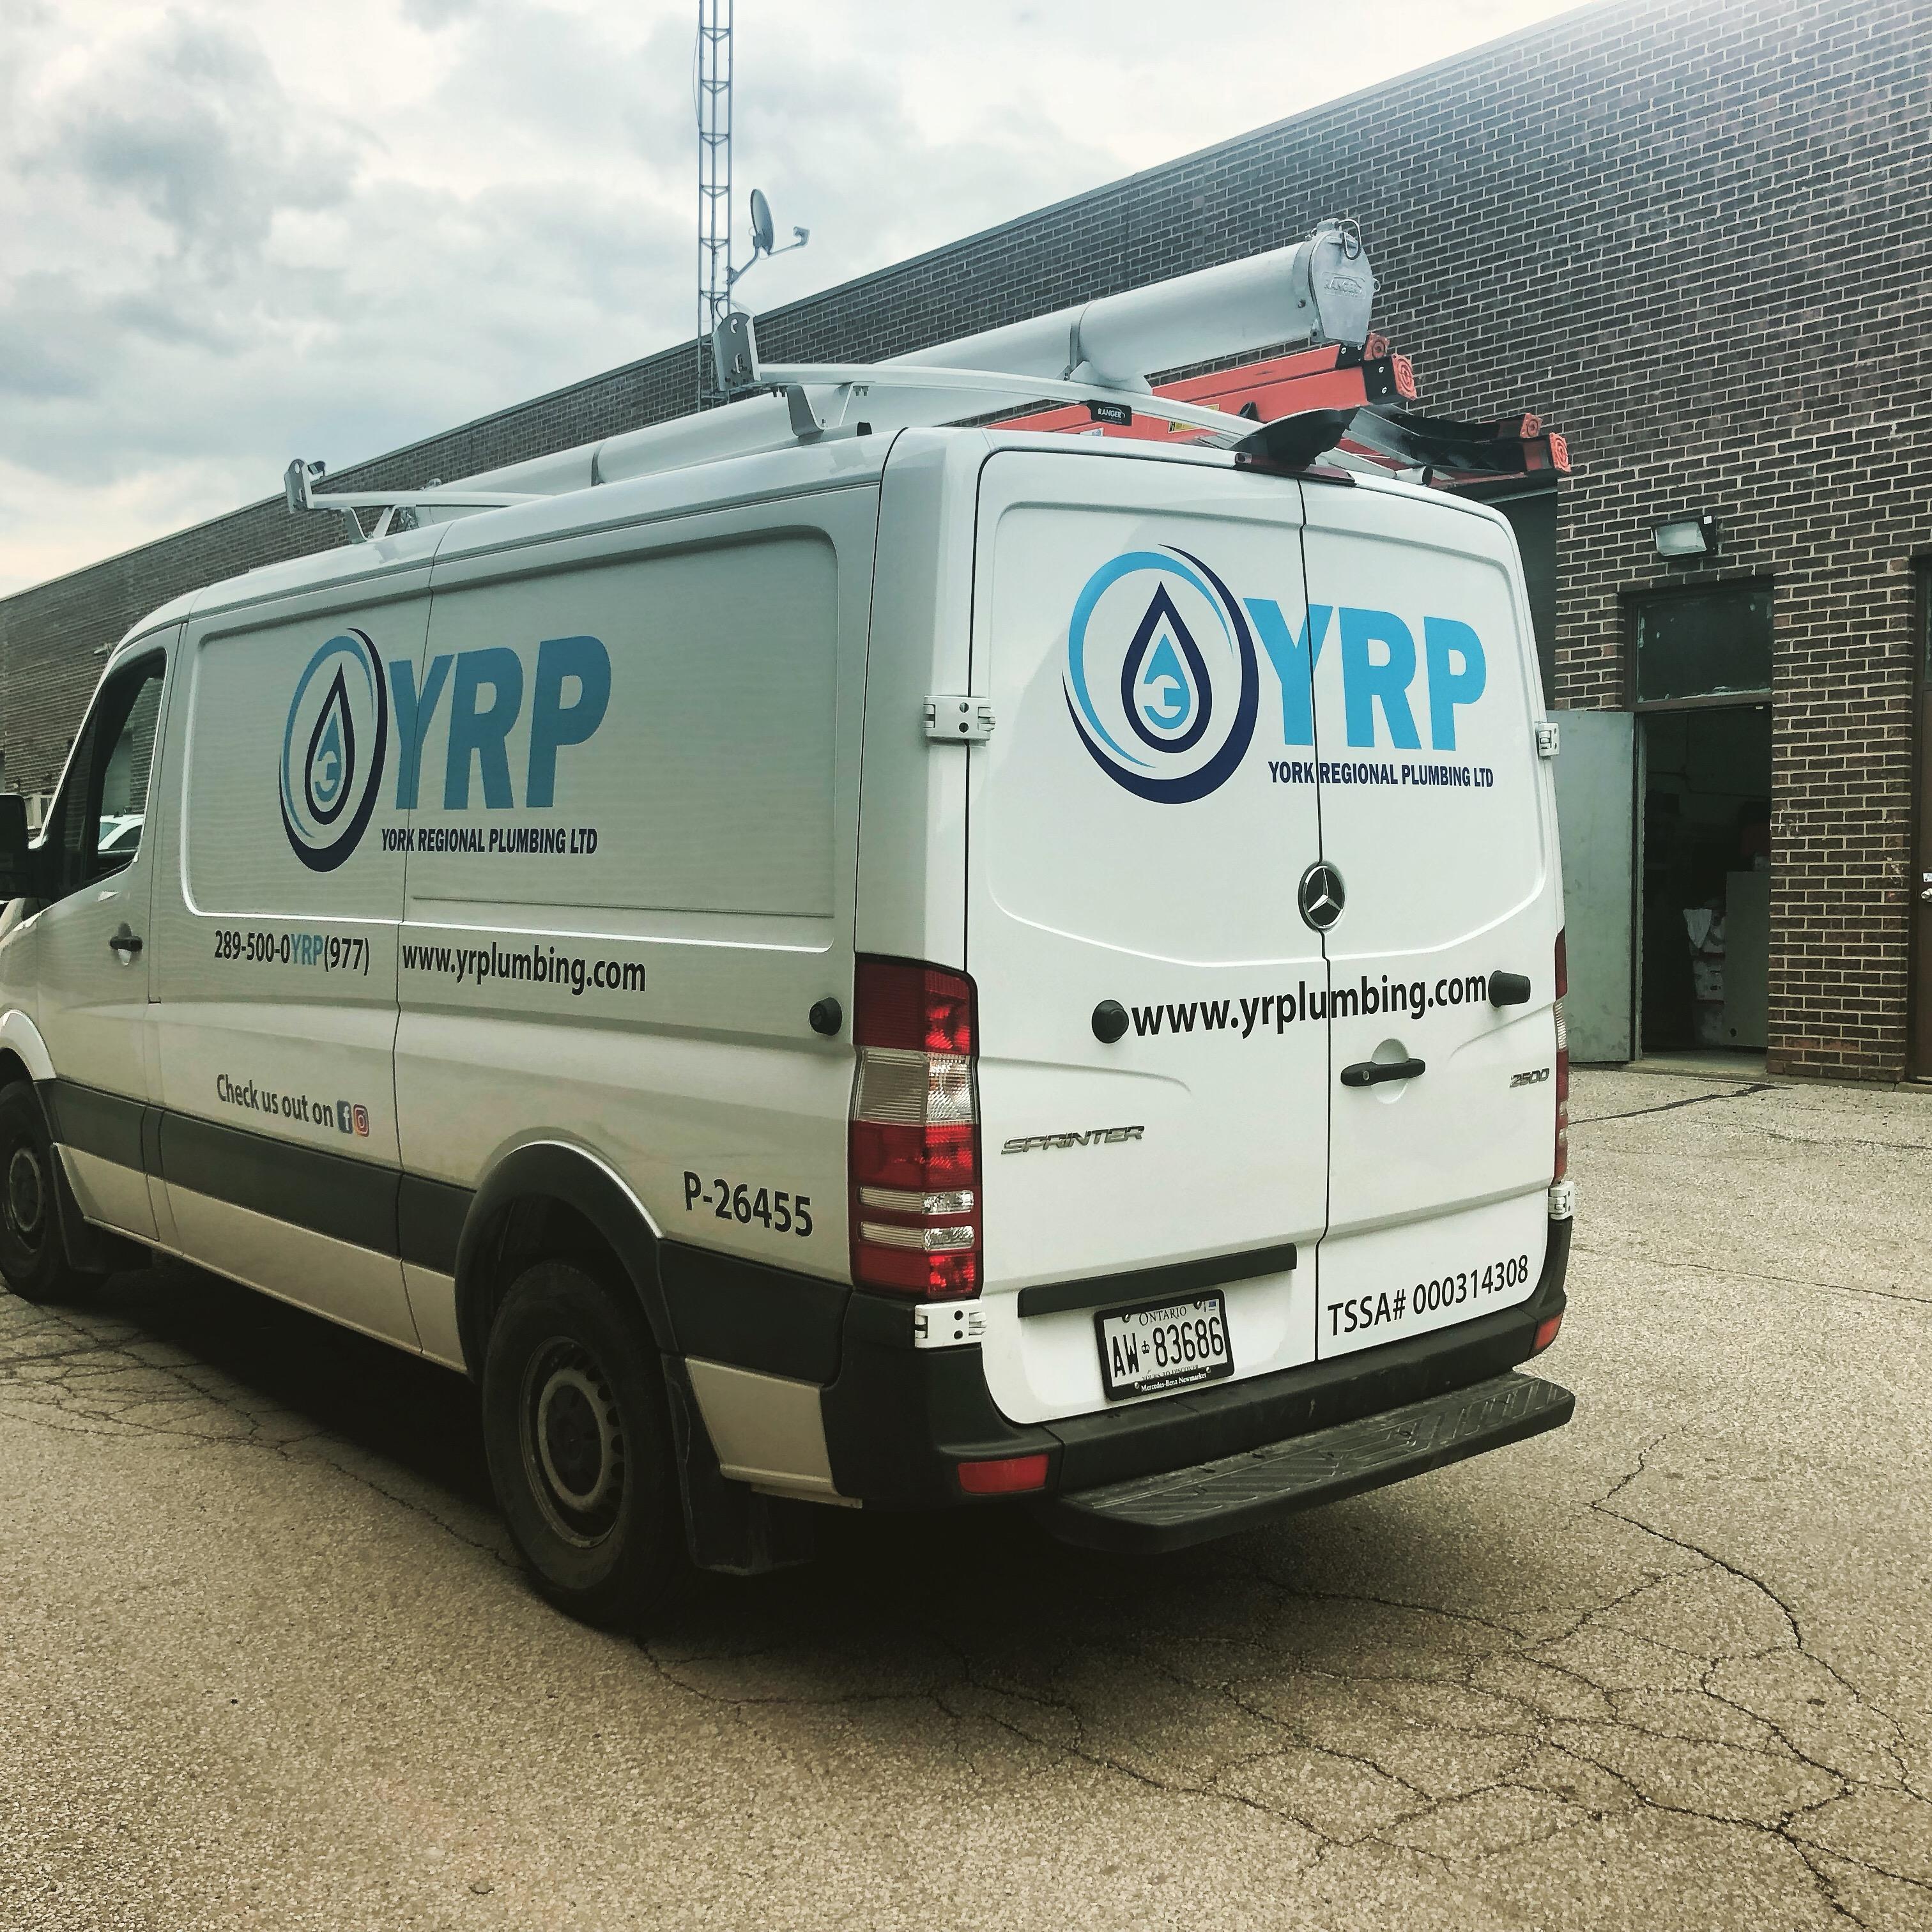 York Regional Plumbing Ltd.